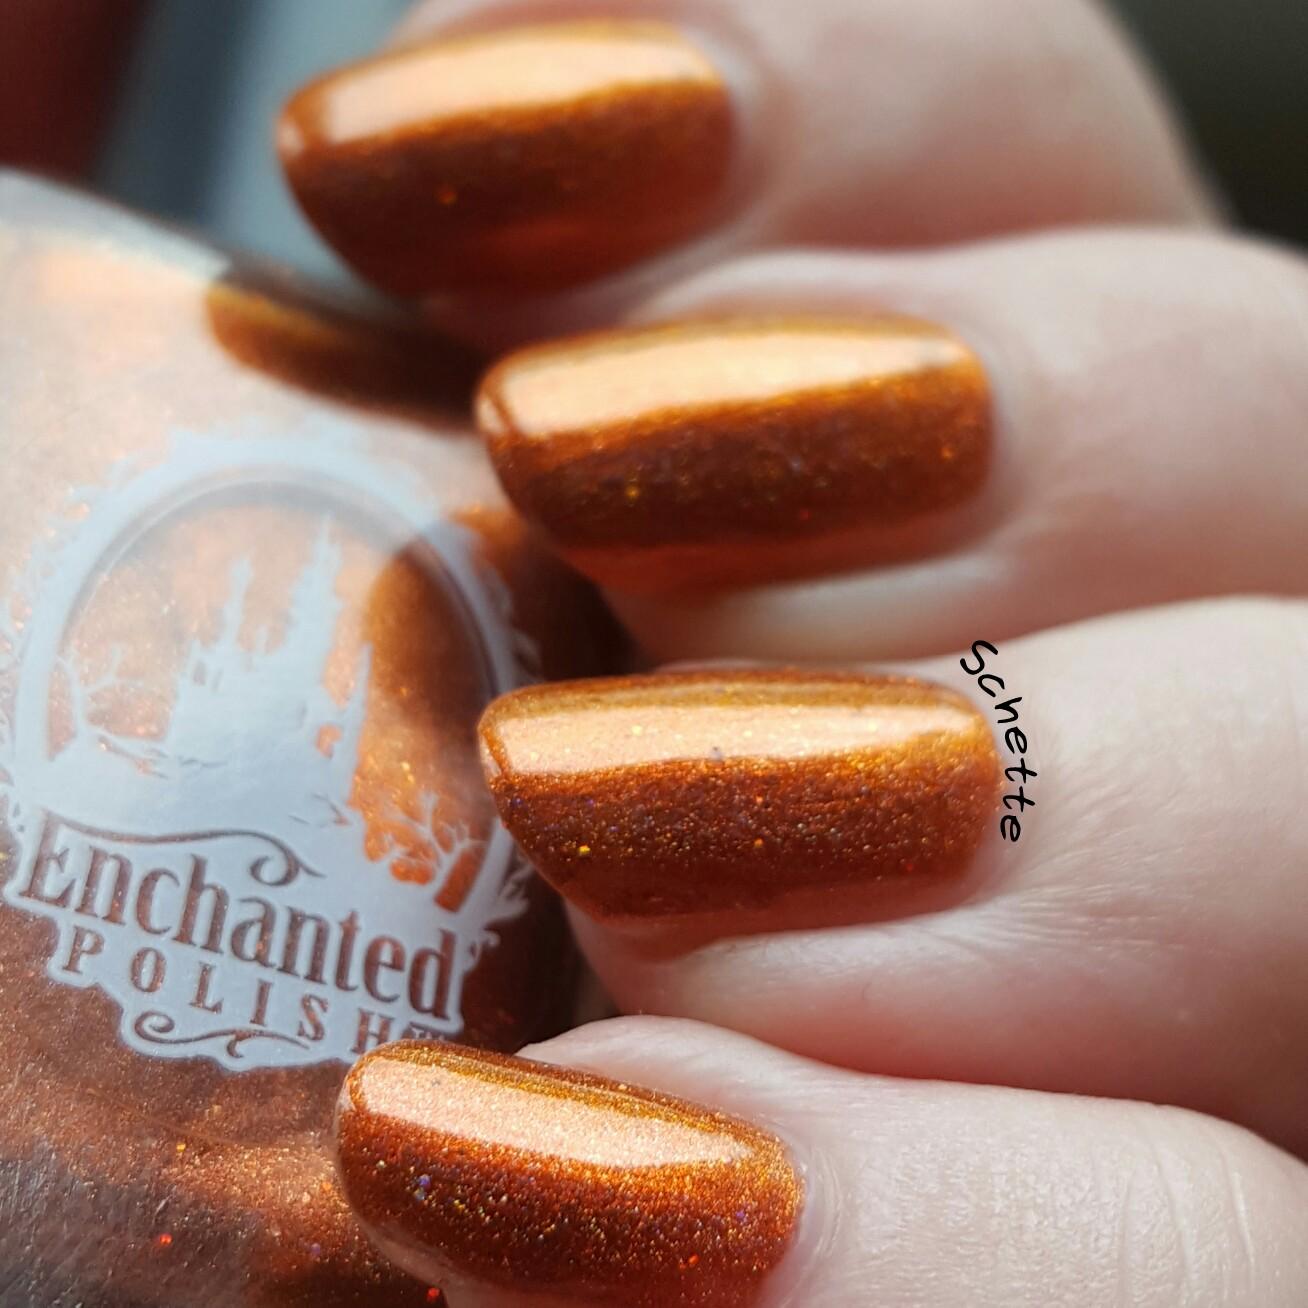 Enchanted Polish : Pumpkin Spice